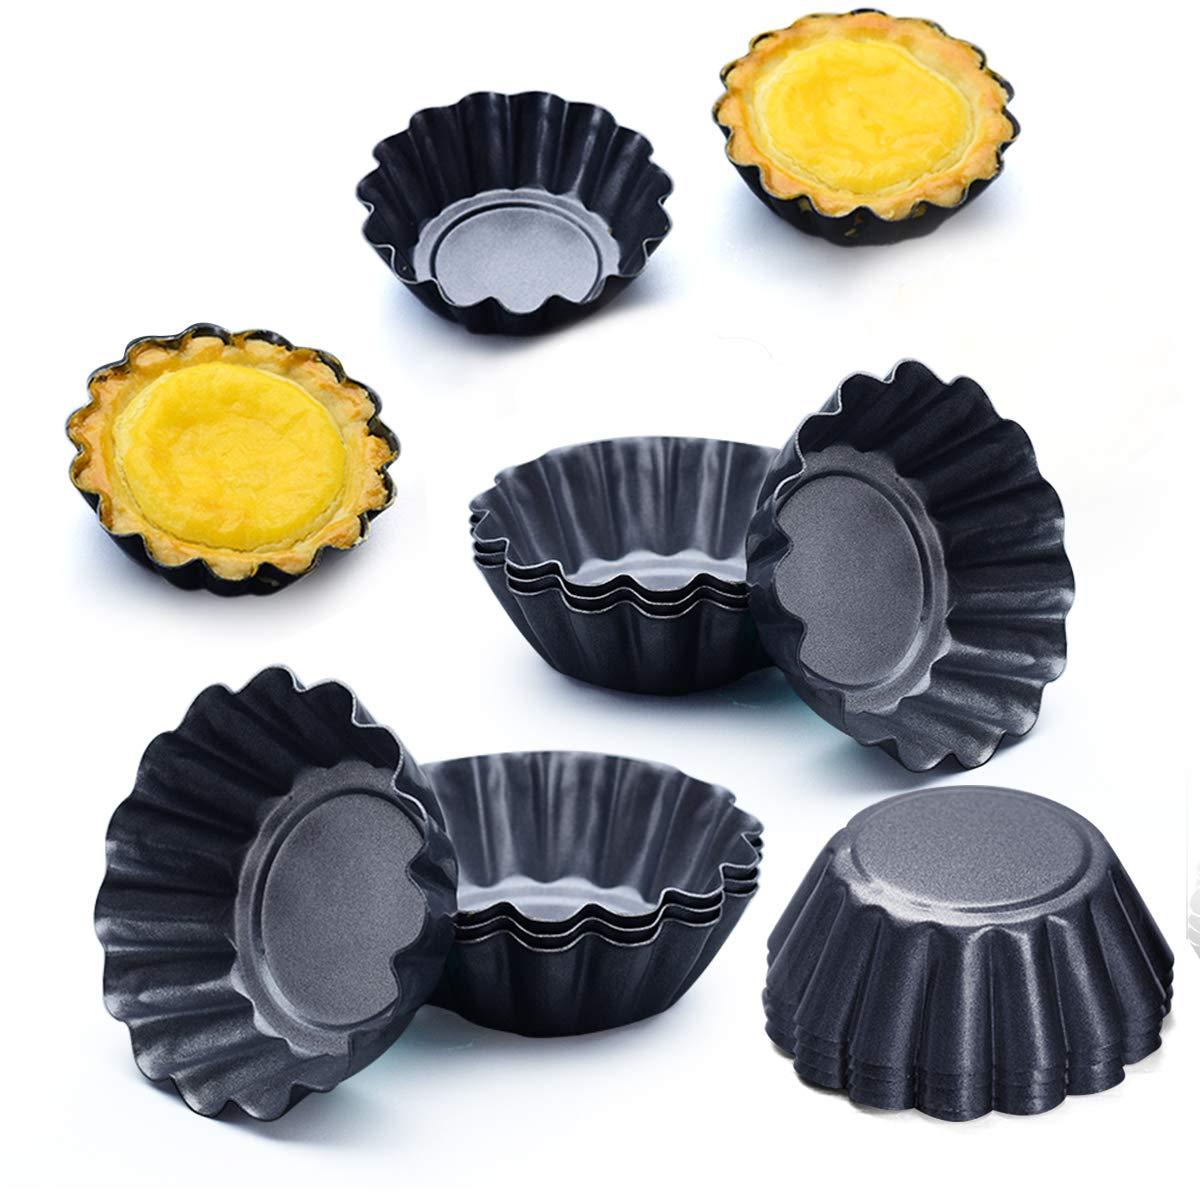 10PCS*  Cake Cookie Mold  7CM Egg Tart Aluminum Cupcake Pudding Baking Aid Tool